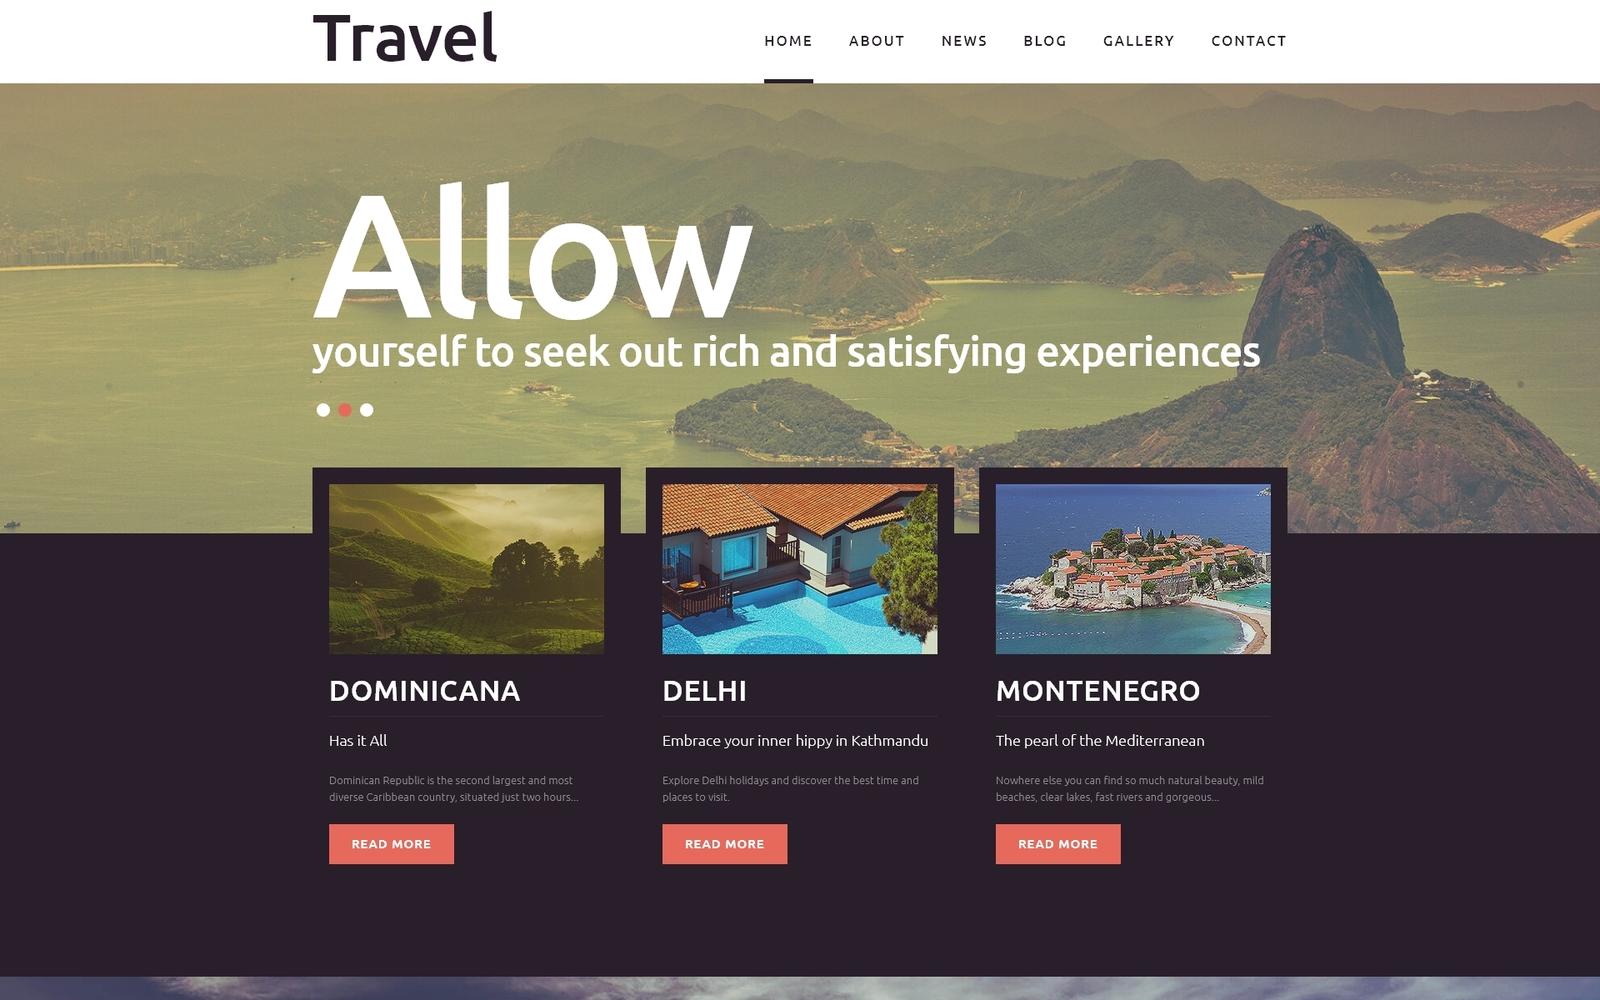 Responsywny szablon Joomla Travel - Fancy Tourism Blog #51191